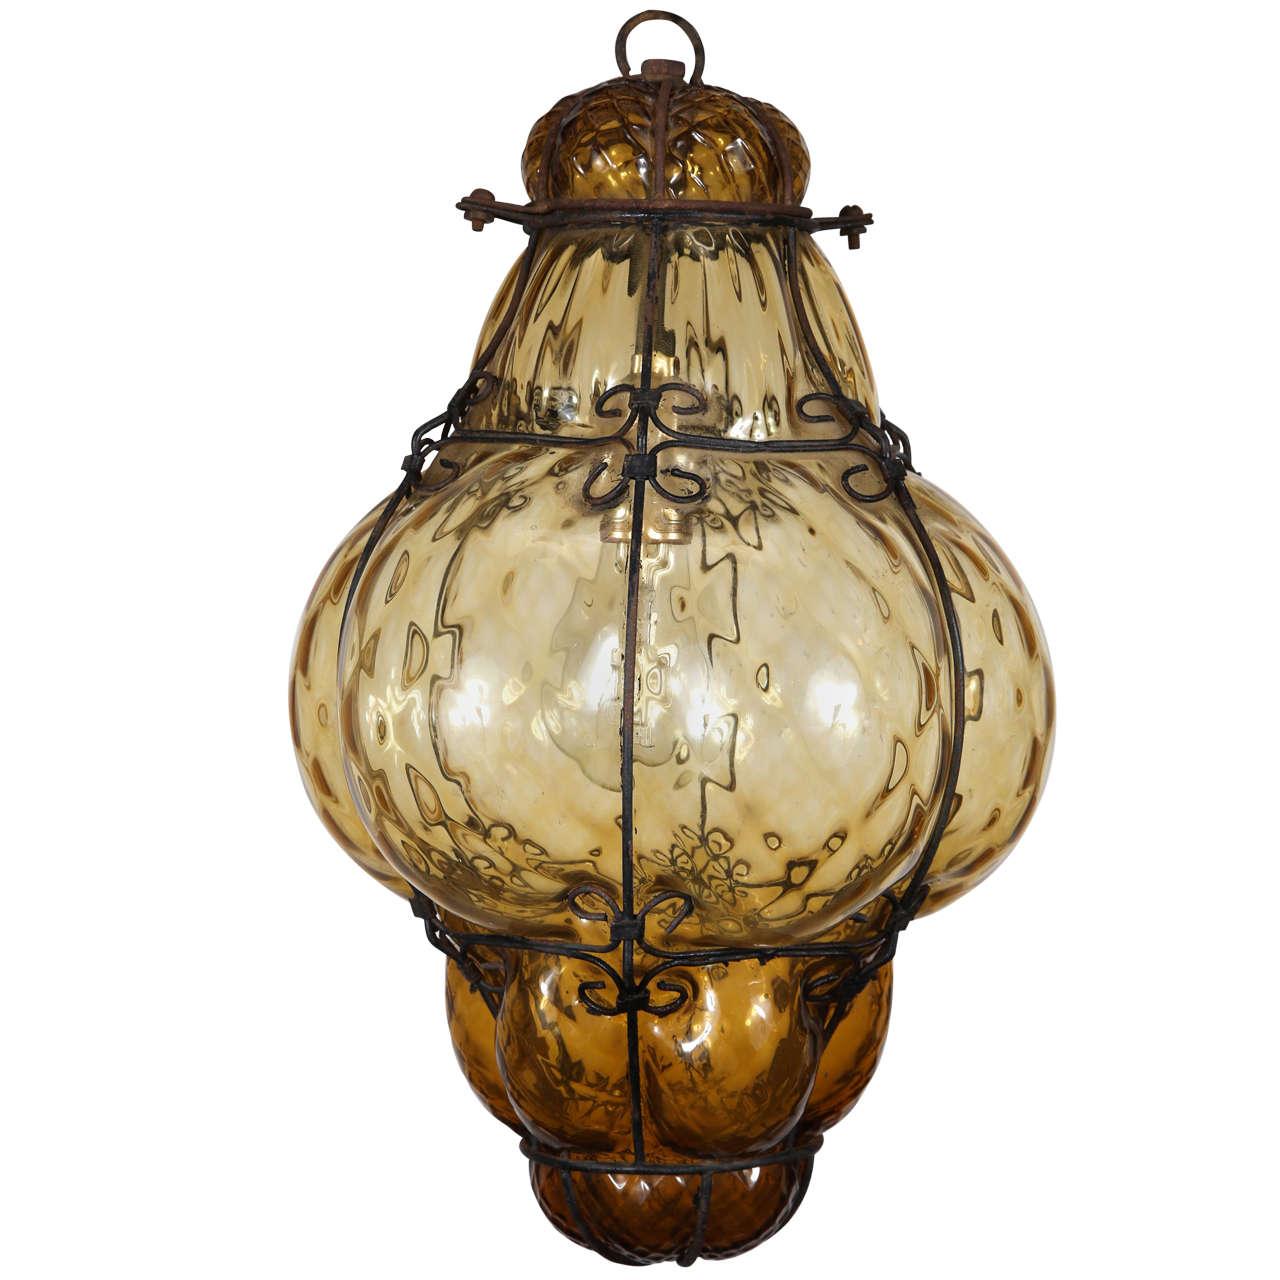 Vintage Handblown Seguso Murano Amber Glass Cage Pendant Light at